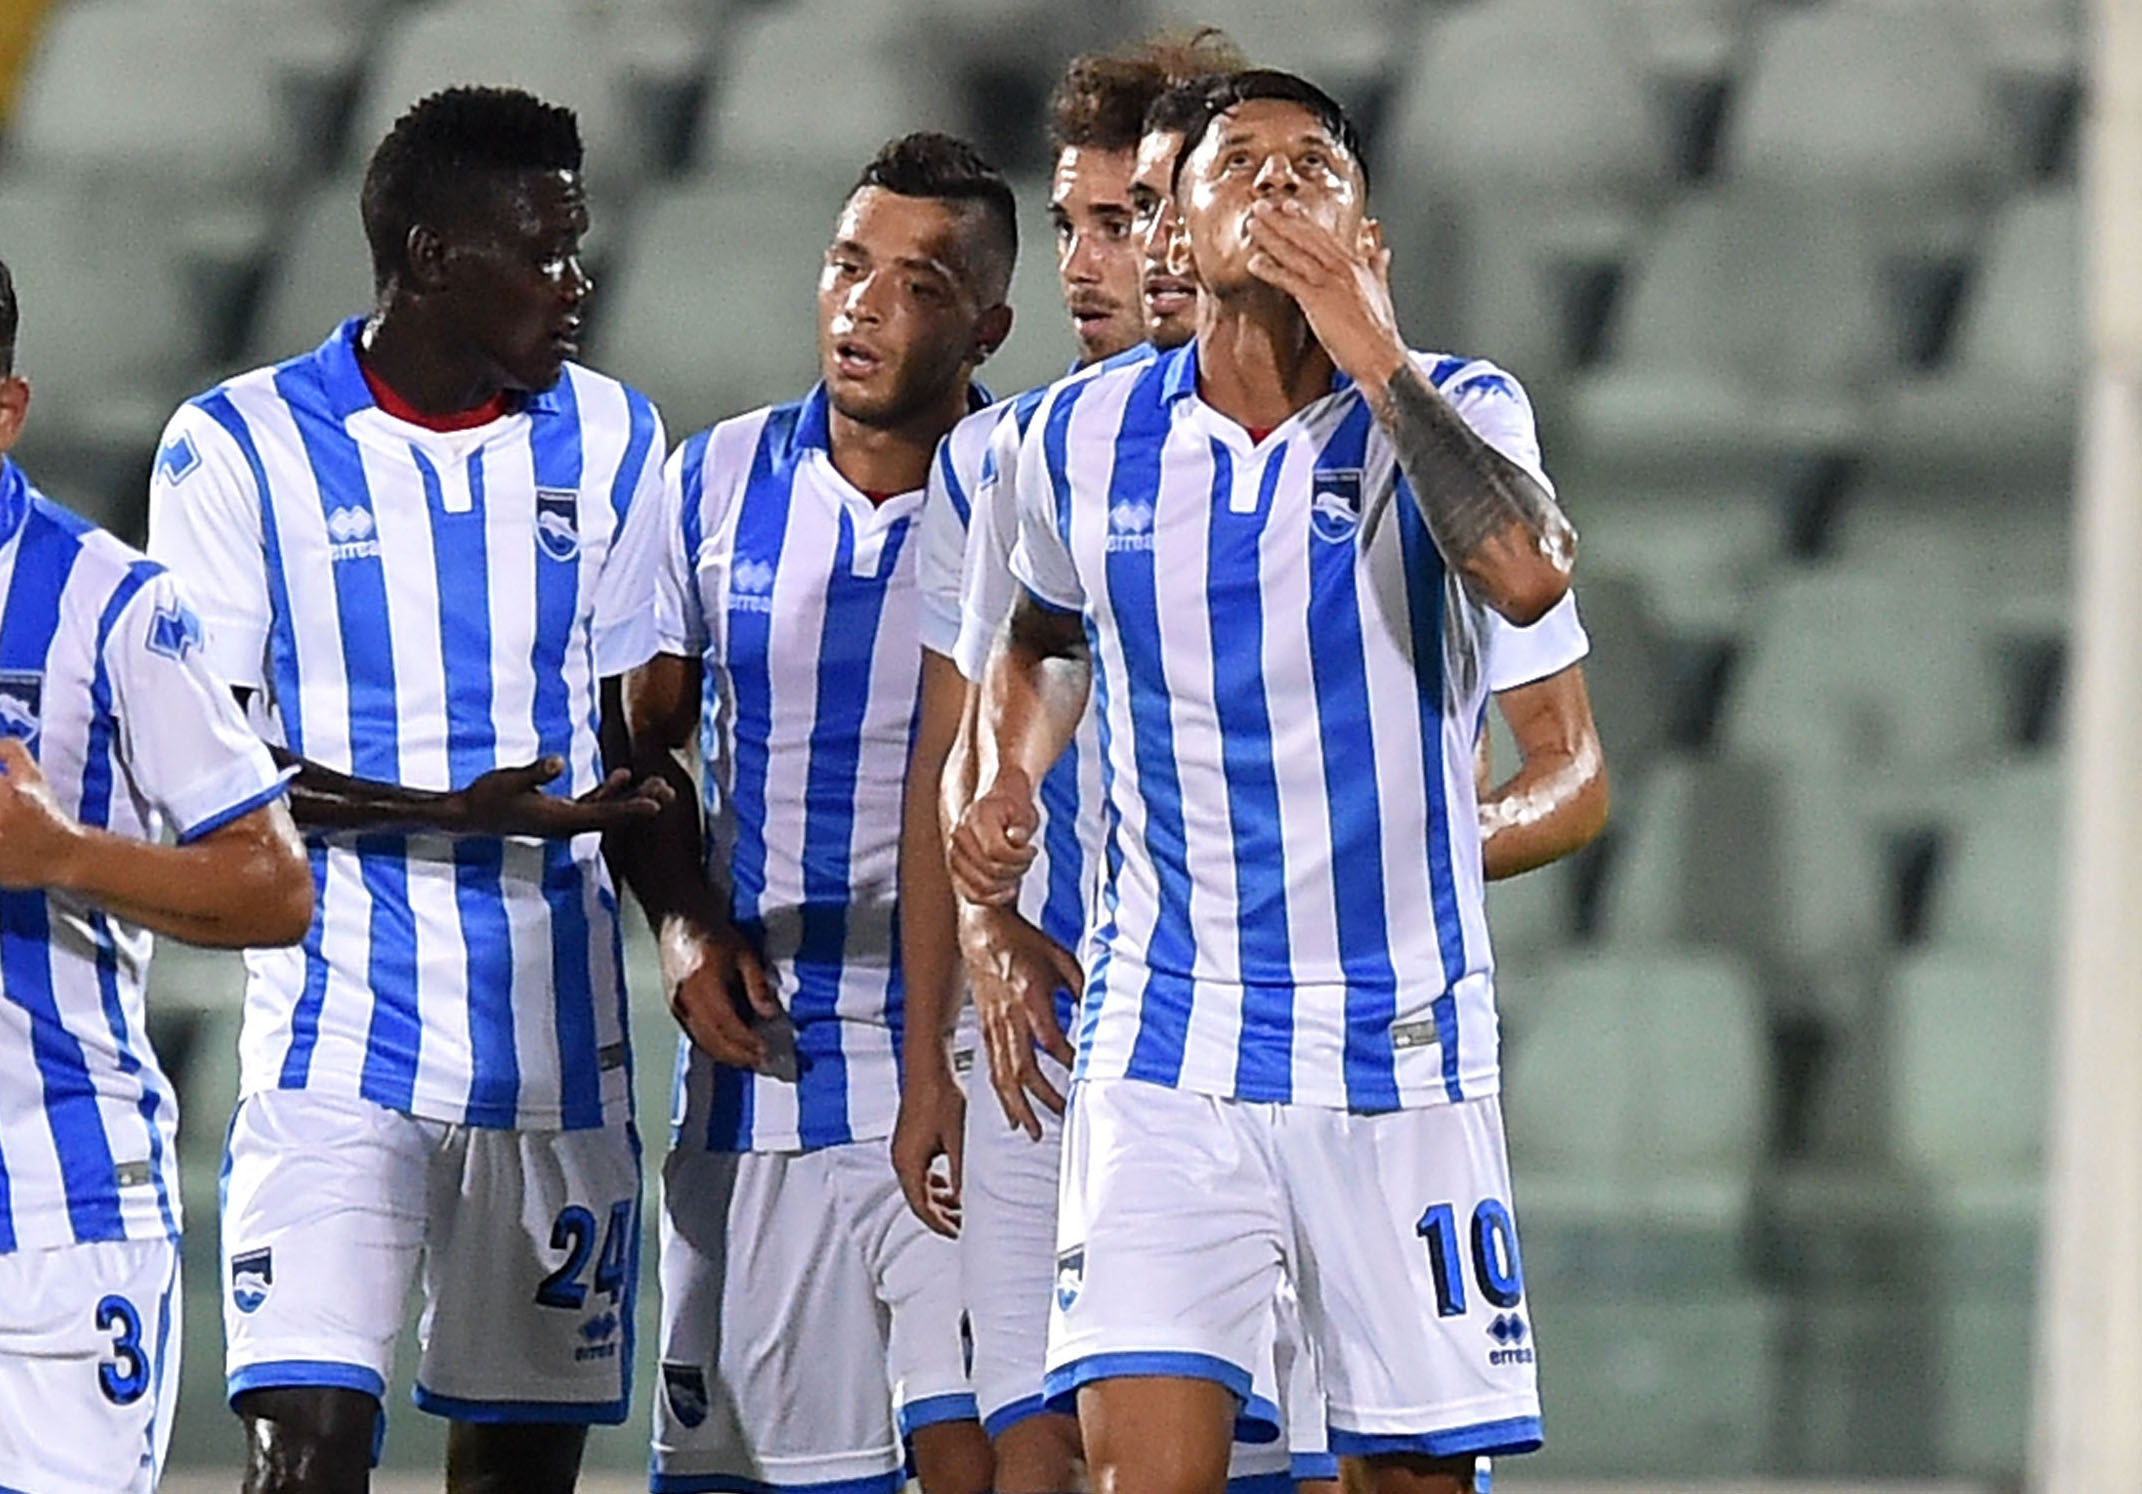 Pescara Calcio v US Sassuolo Calcio - Preseason Friendly